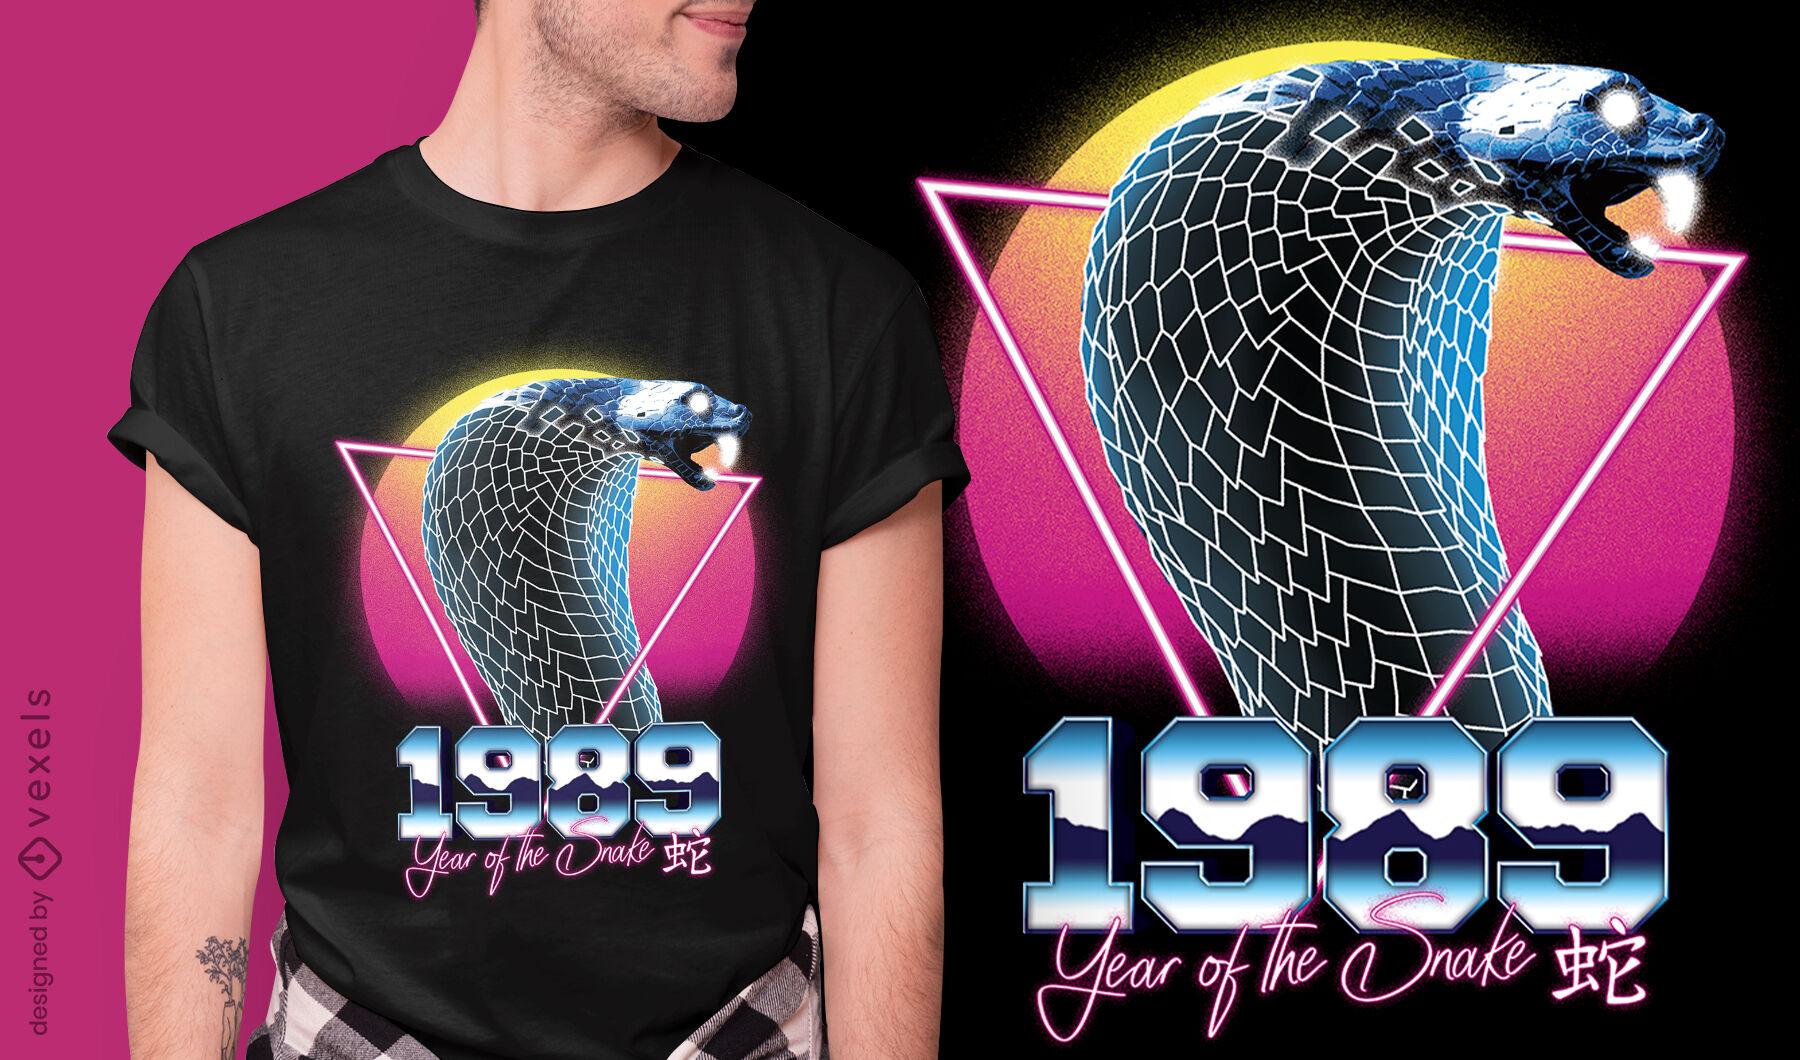 Snake chinese retrowave zodiac t-shirt psd